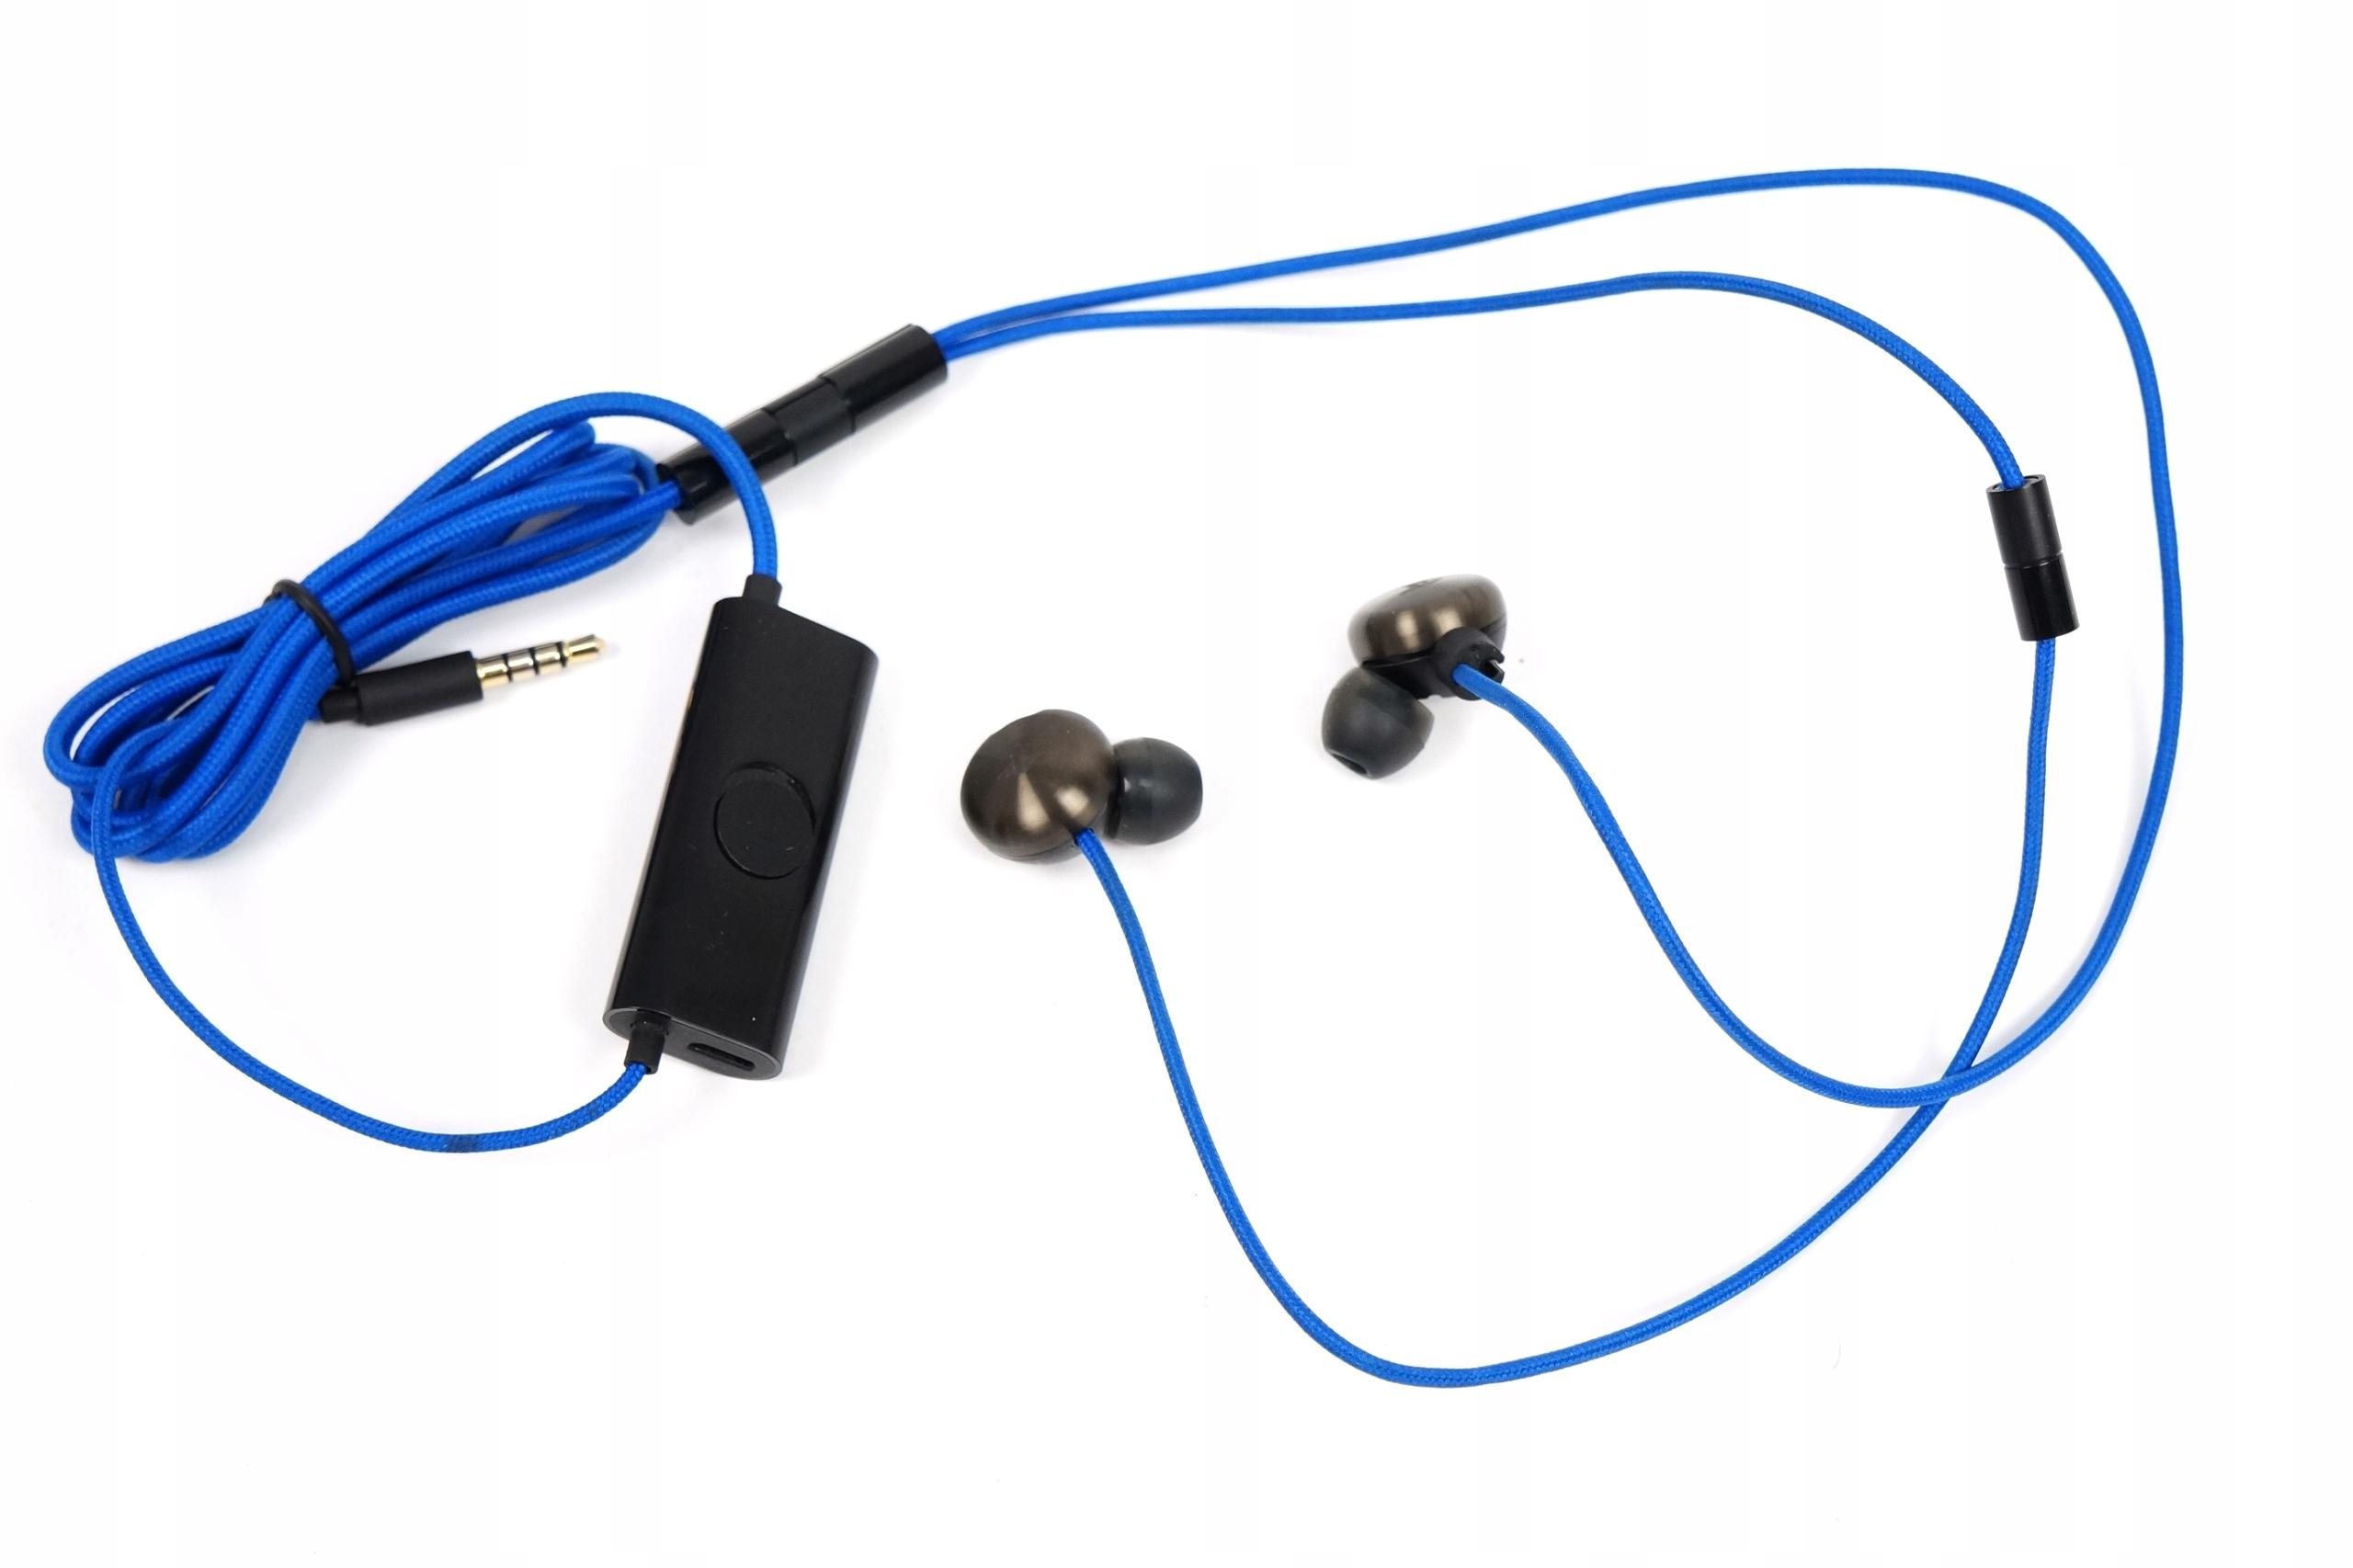 Słuchawki Sony PlayStation In-ear Stereo Headset